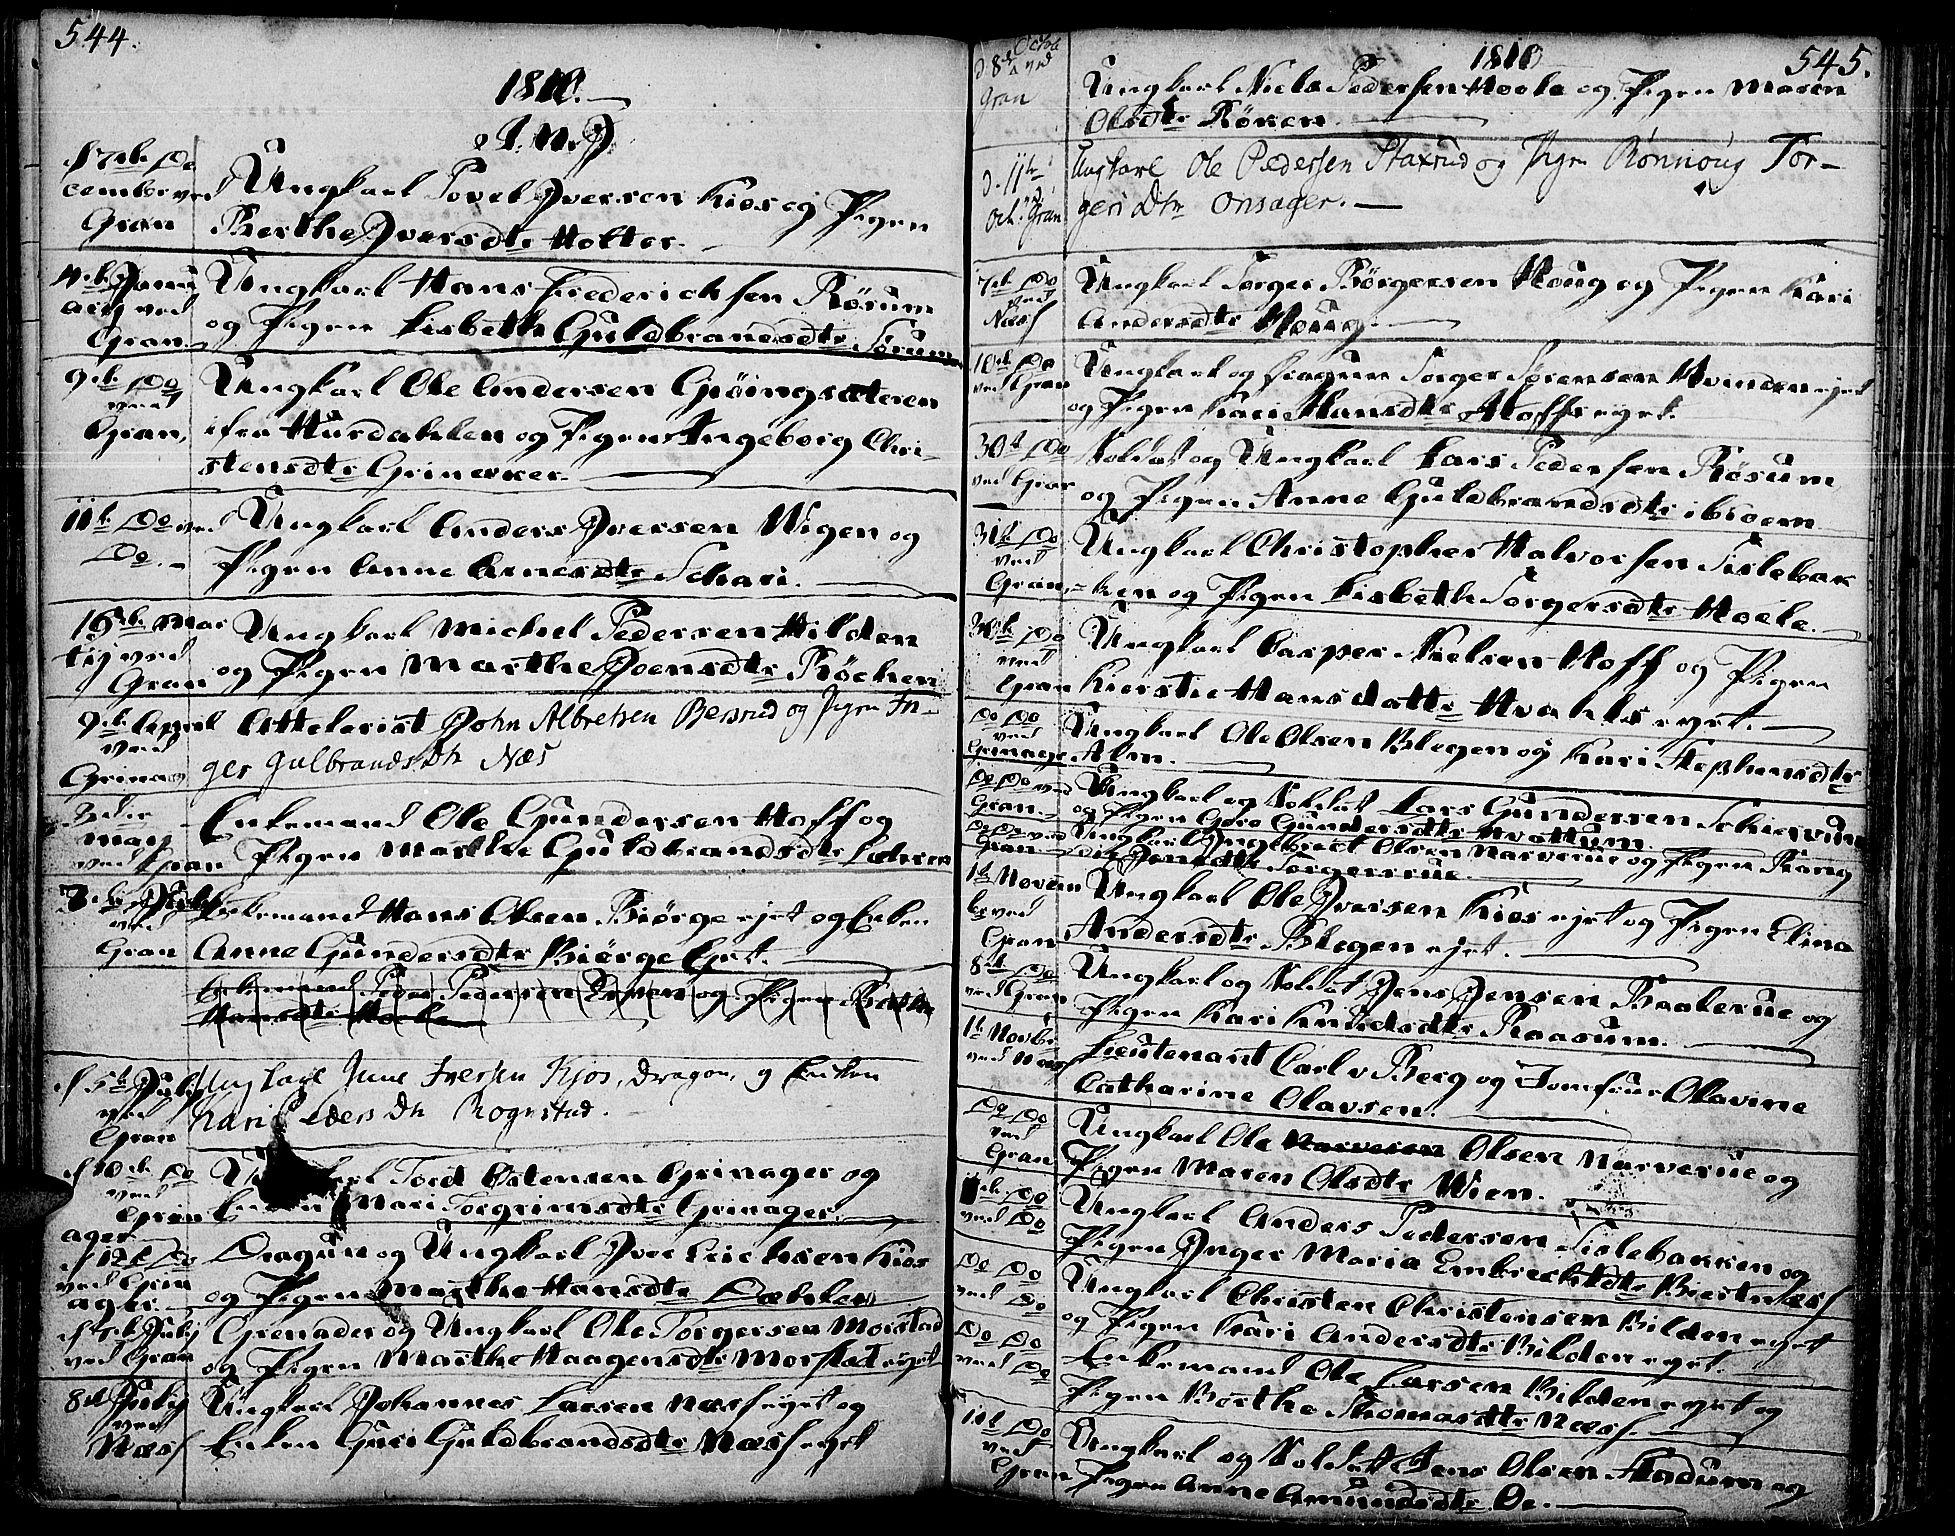 SAH, Gran prestekontor, Ministerialbok nr. 6, 1787-1824, s. 544-545